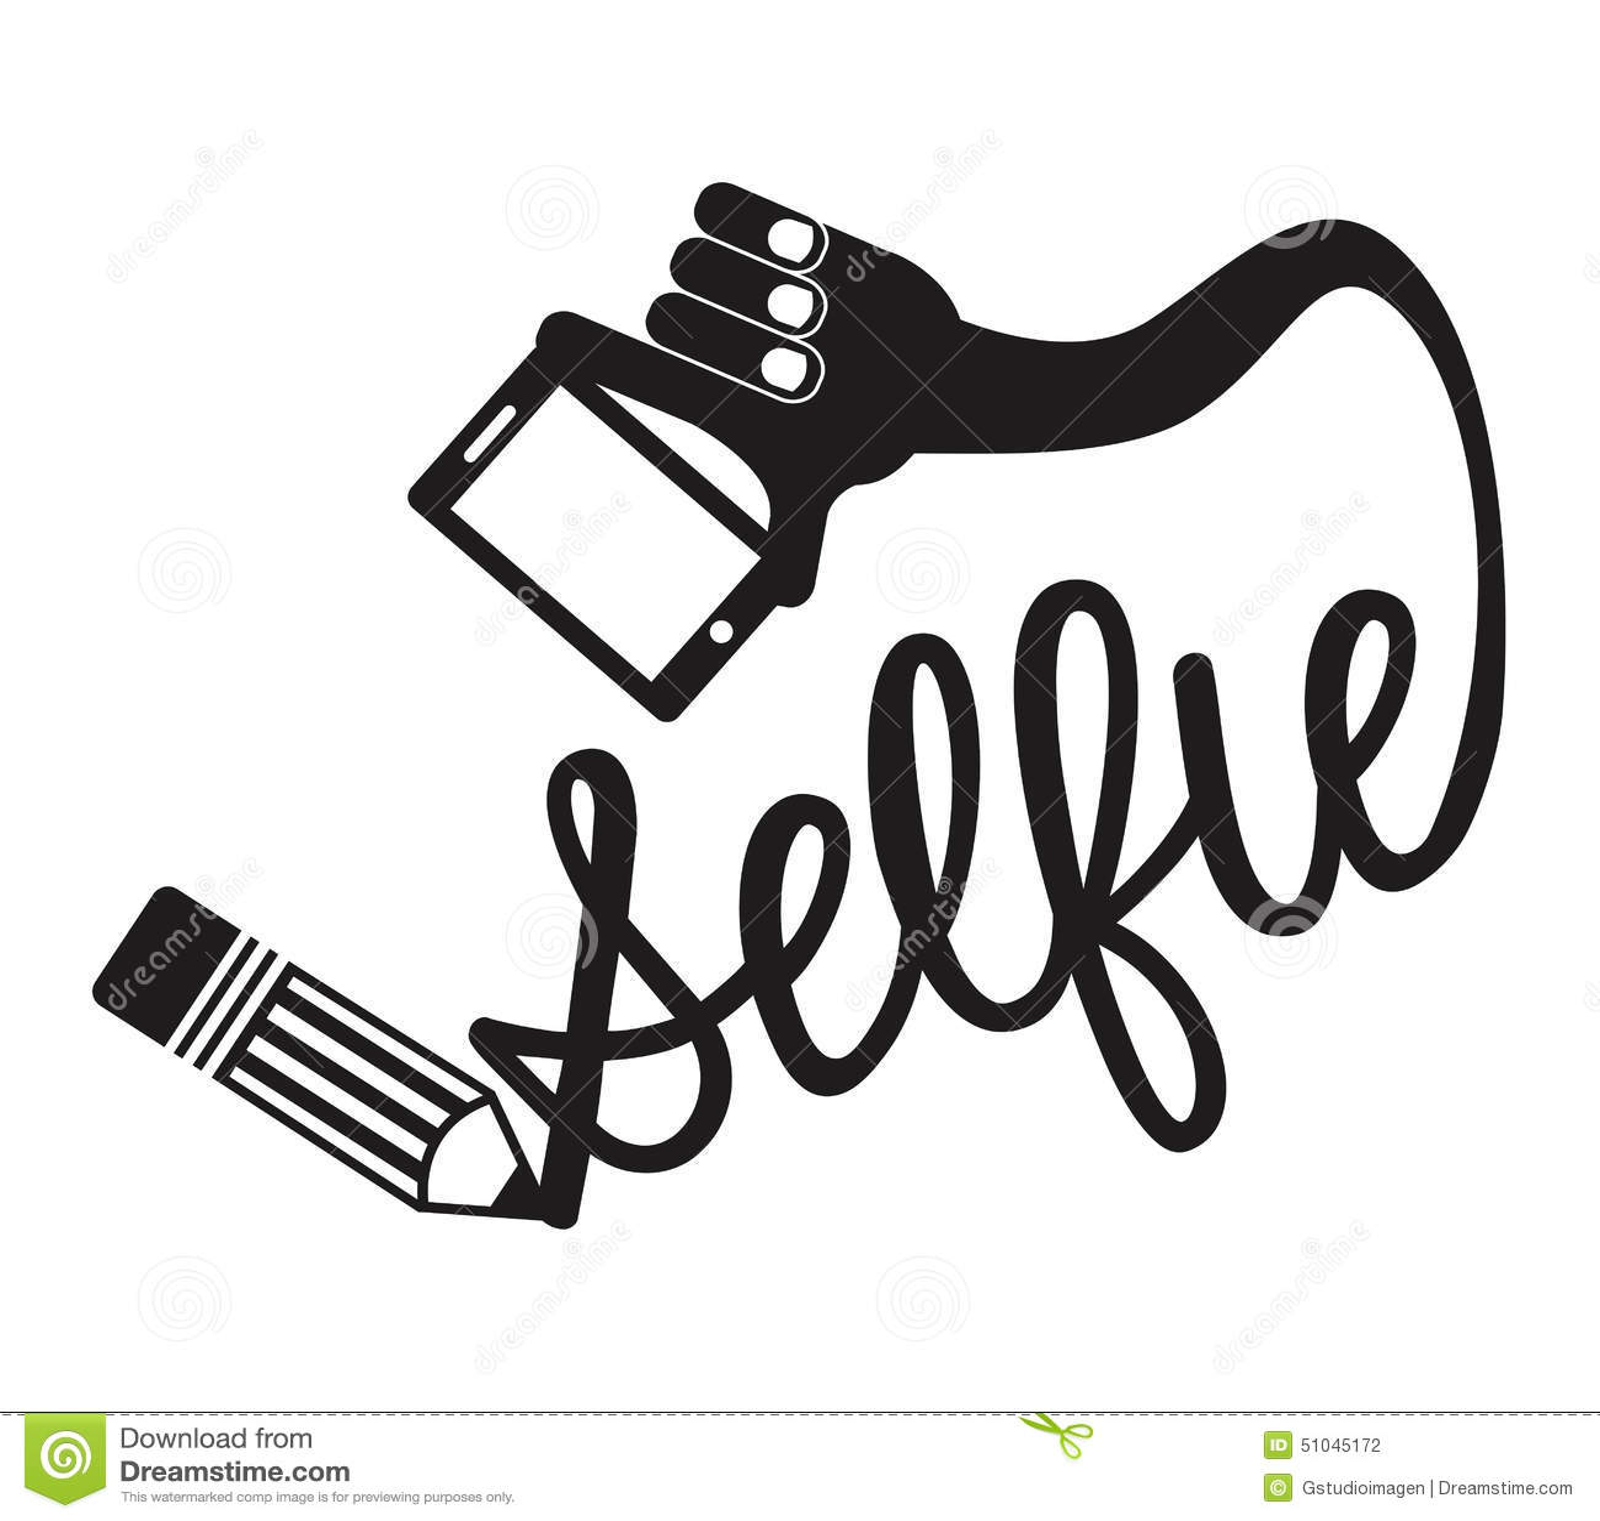 Selfie Graphic Stock Vector Illustration Of Eps10 Poster